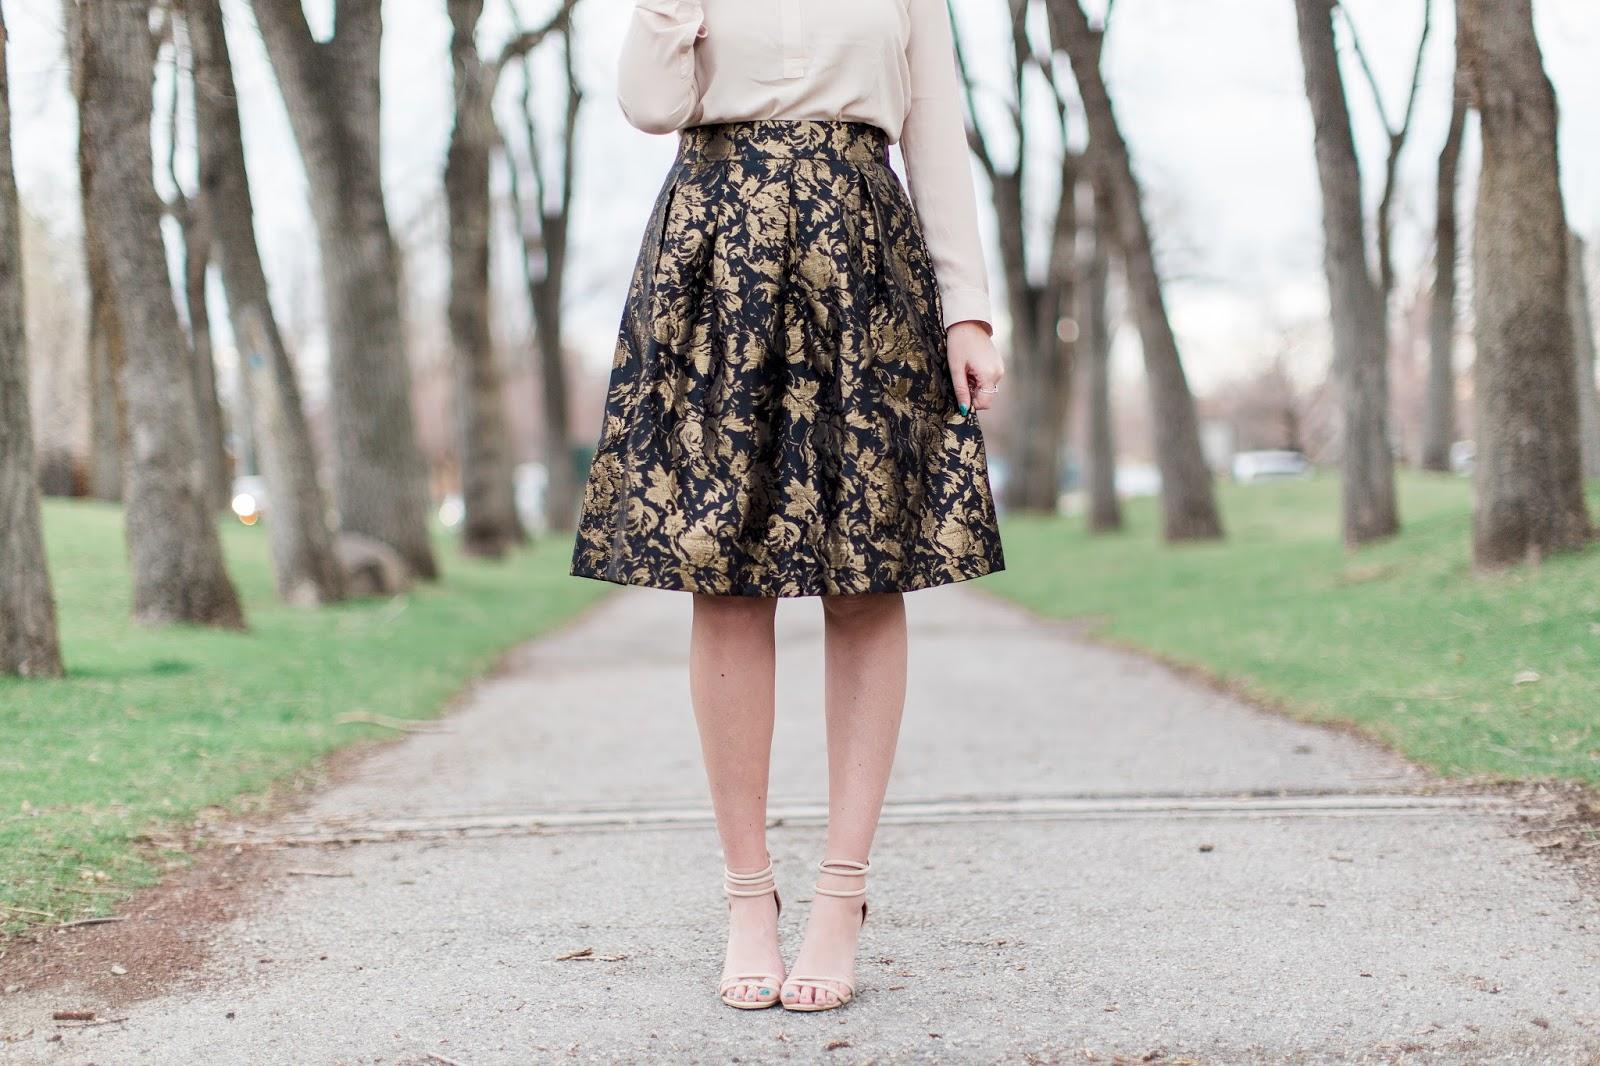 Nude heels, Jacquard skirt, Modesty